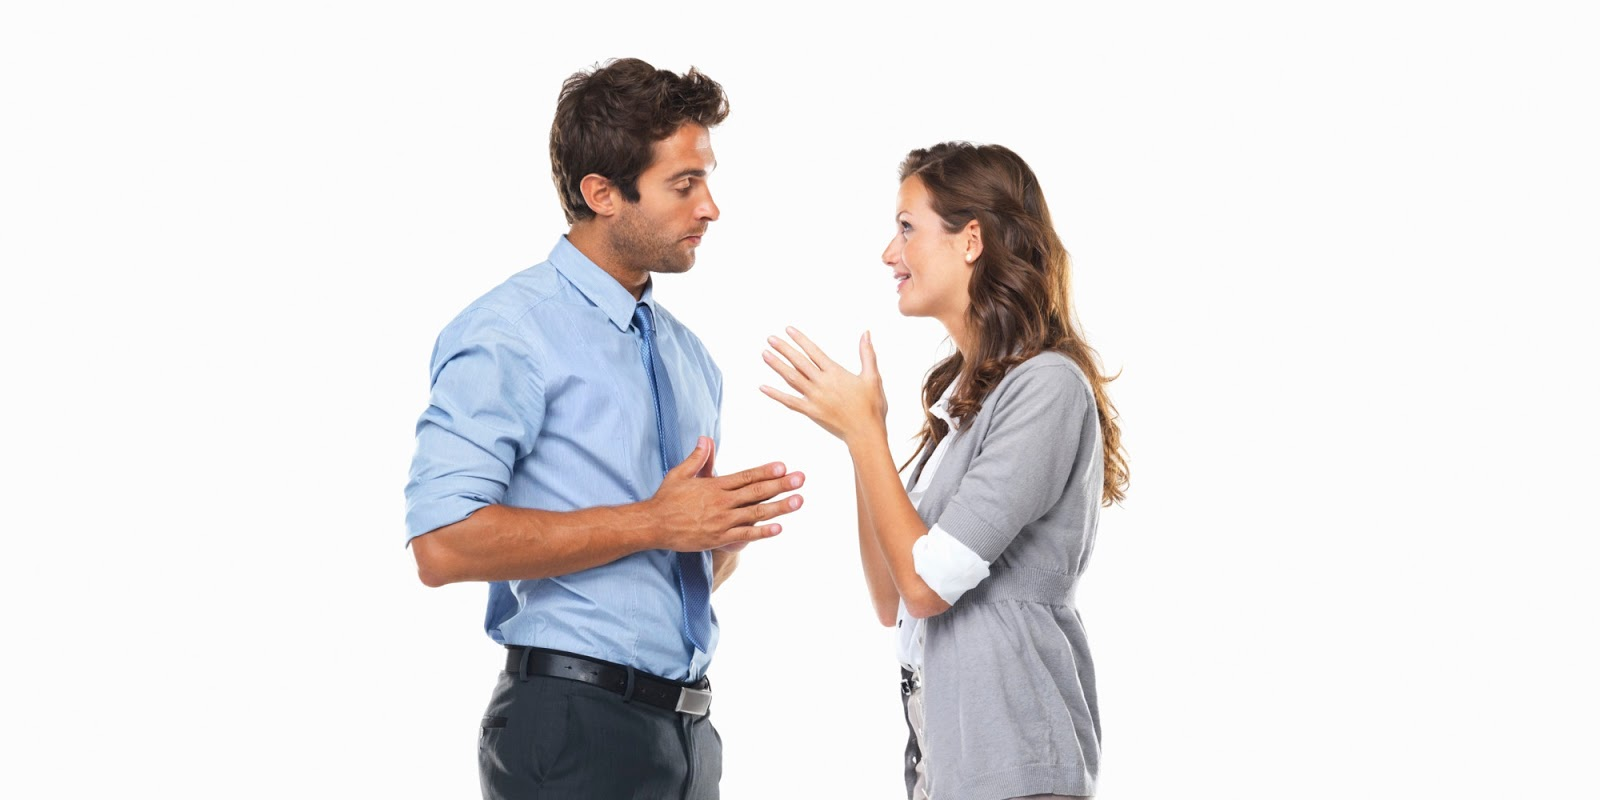 Percakapan bahasa inggris